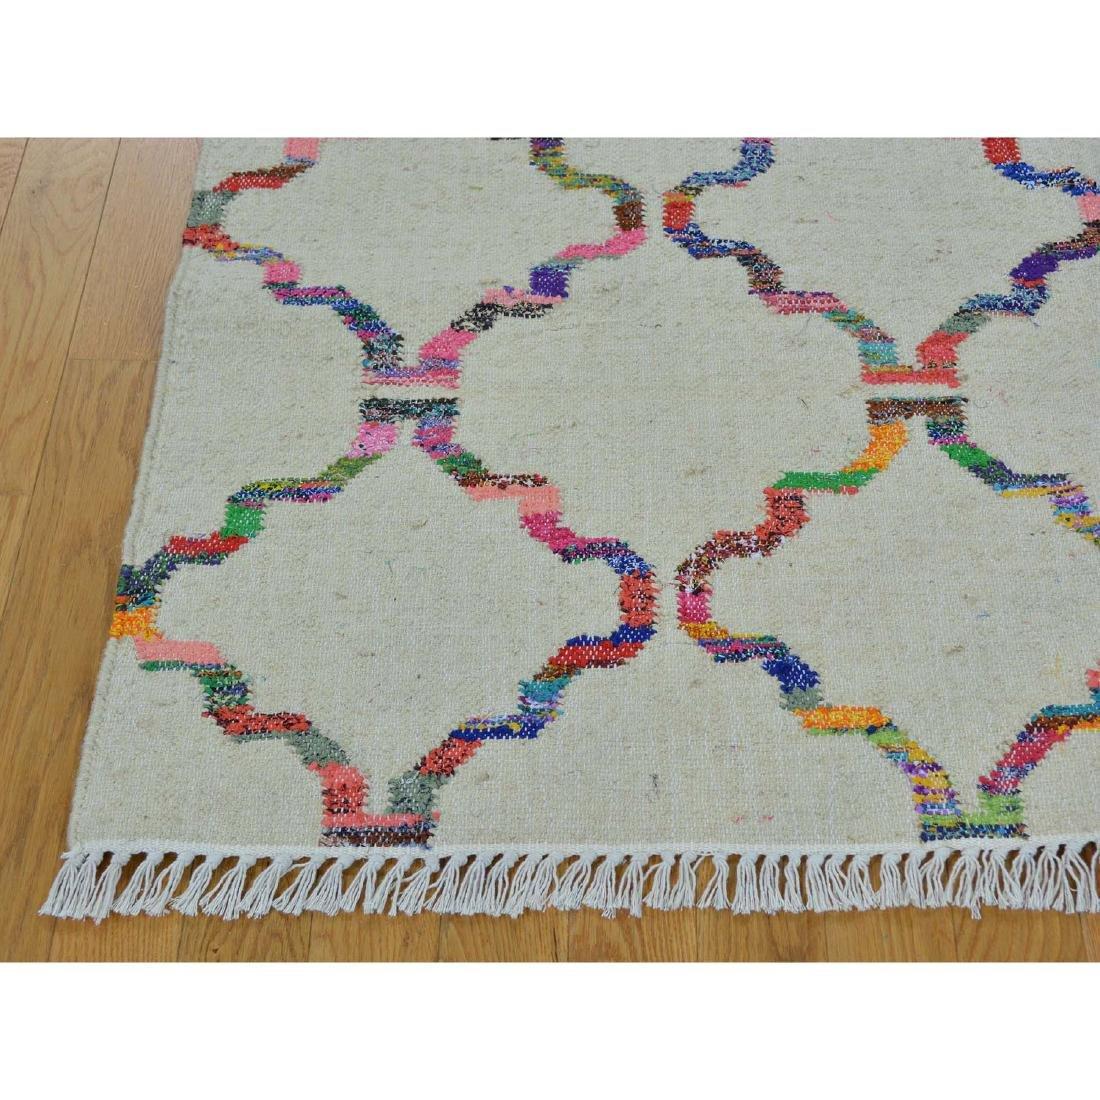 Durie Kilim Wool & Sari Silk Hand Woven Rug 5.2x7.1 - 3